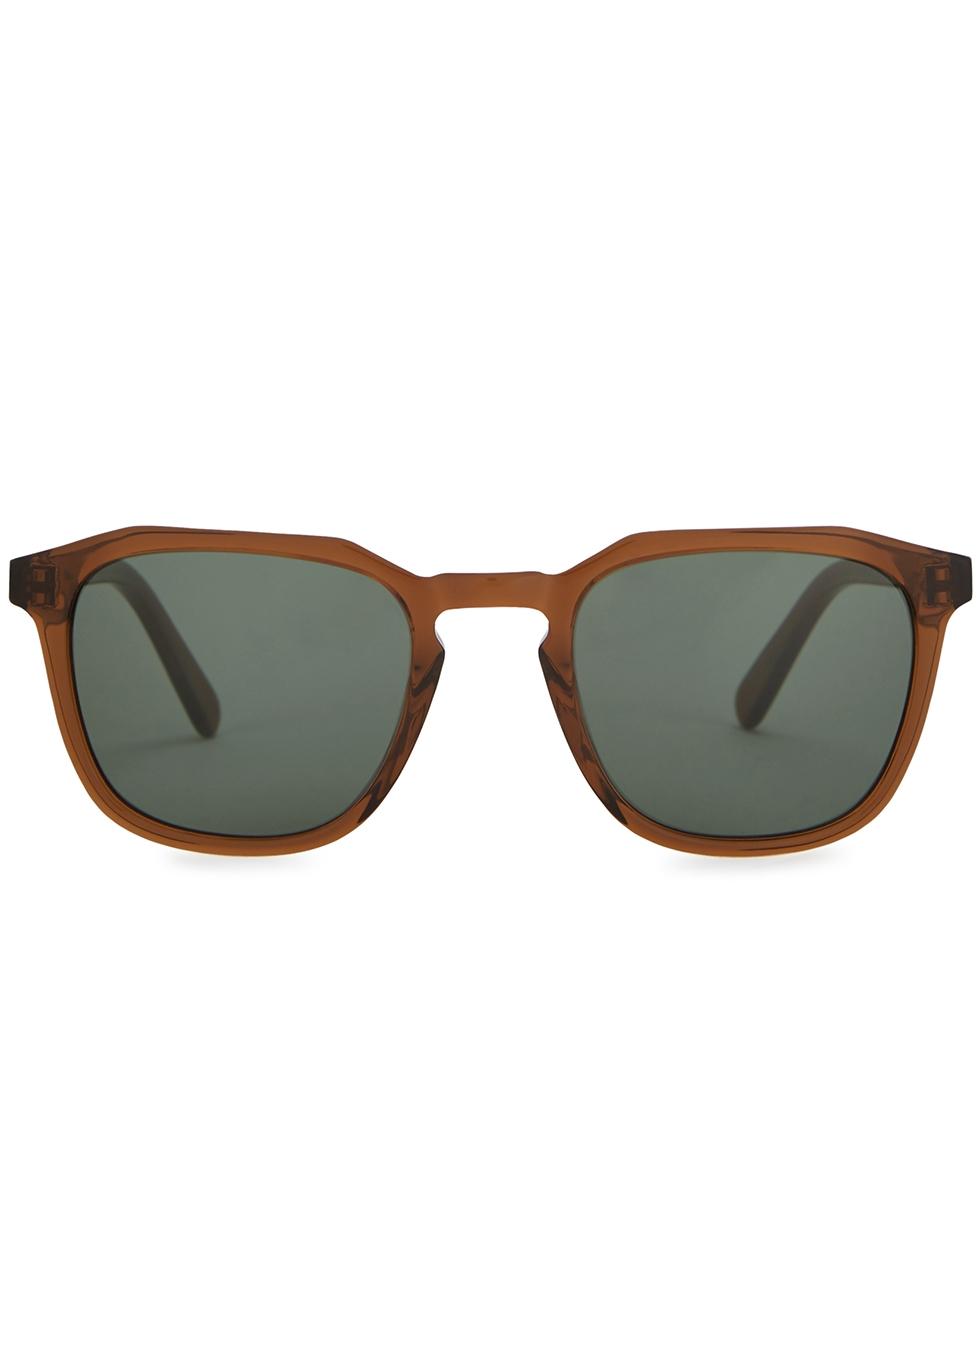 Marshall brown wayfarer-style sunglasses - Finlay & Co